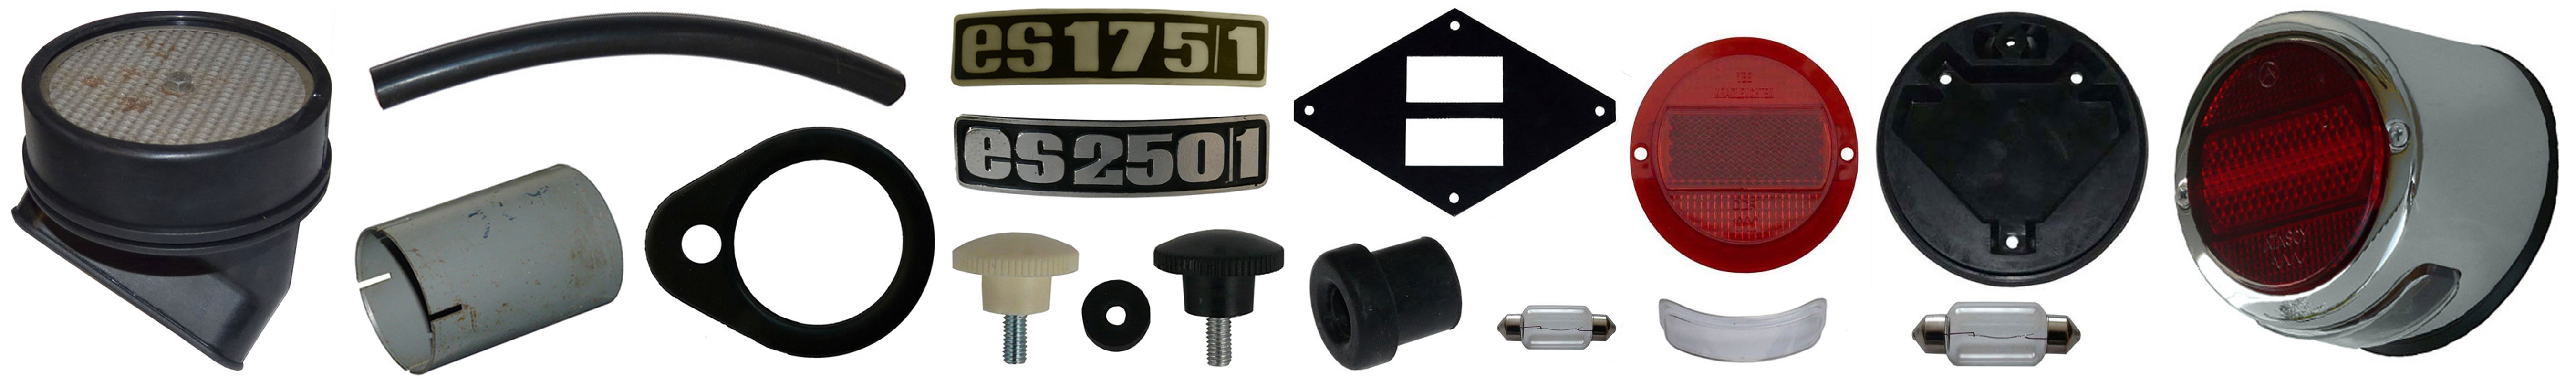 MZ ES 175/1 250/1 Ersatzteile Schutzblech Rücklicht Luftfilter